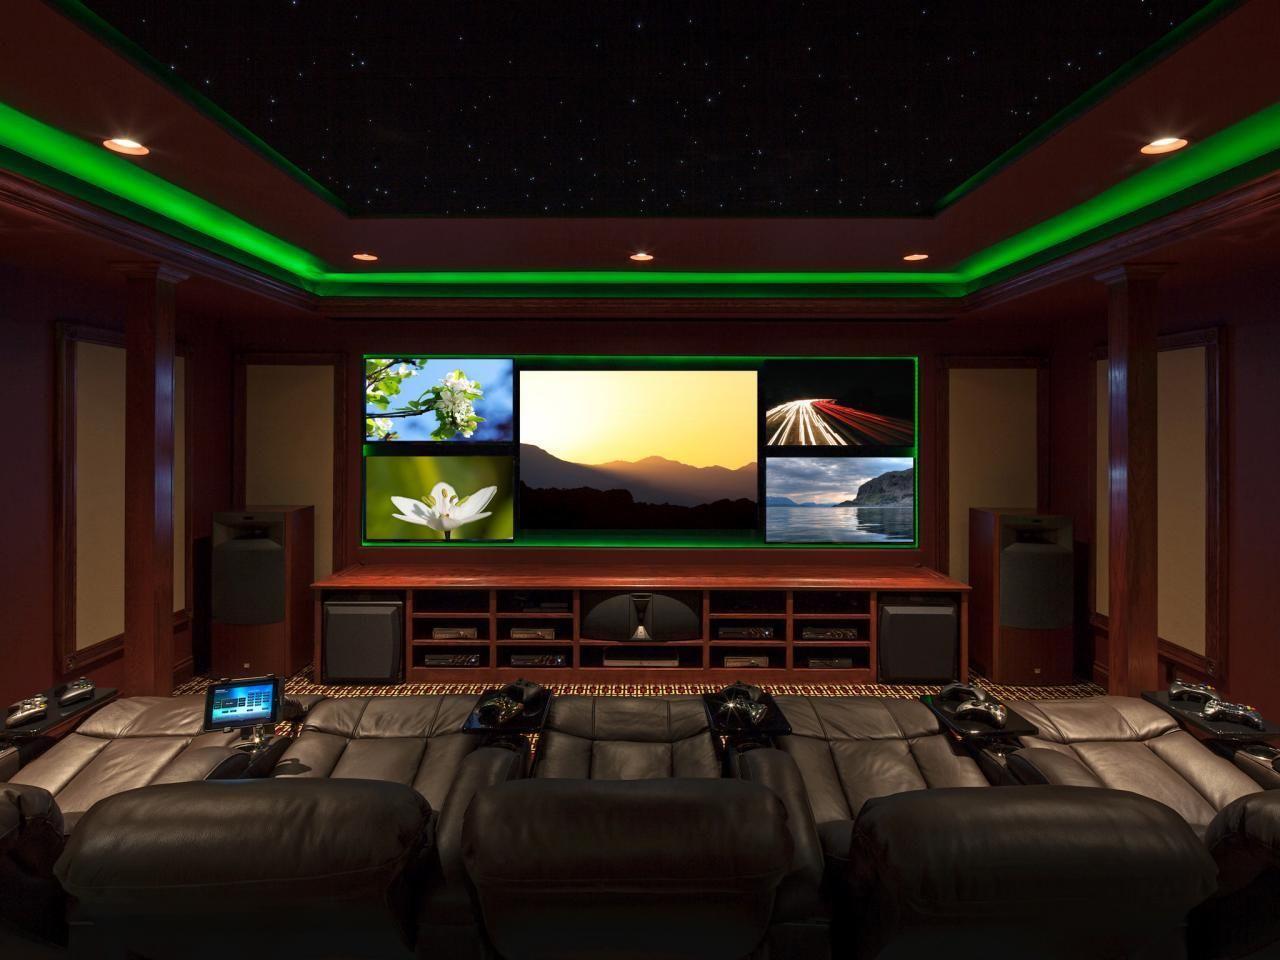 60 Best Setup Of Video Game Room Ideas A Gamer S Guide Video Game Rooms Video Game Room Small Movie Room